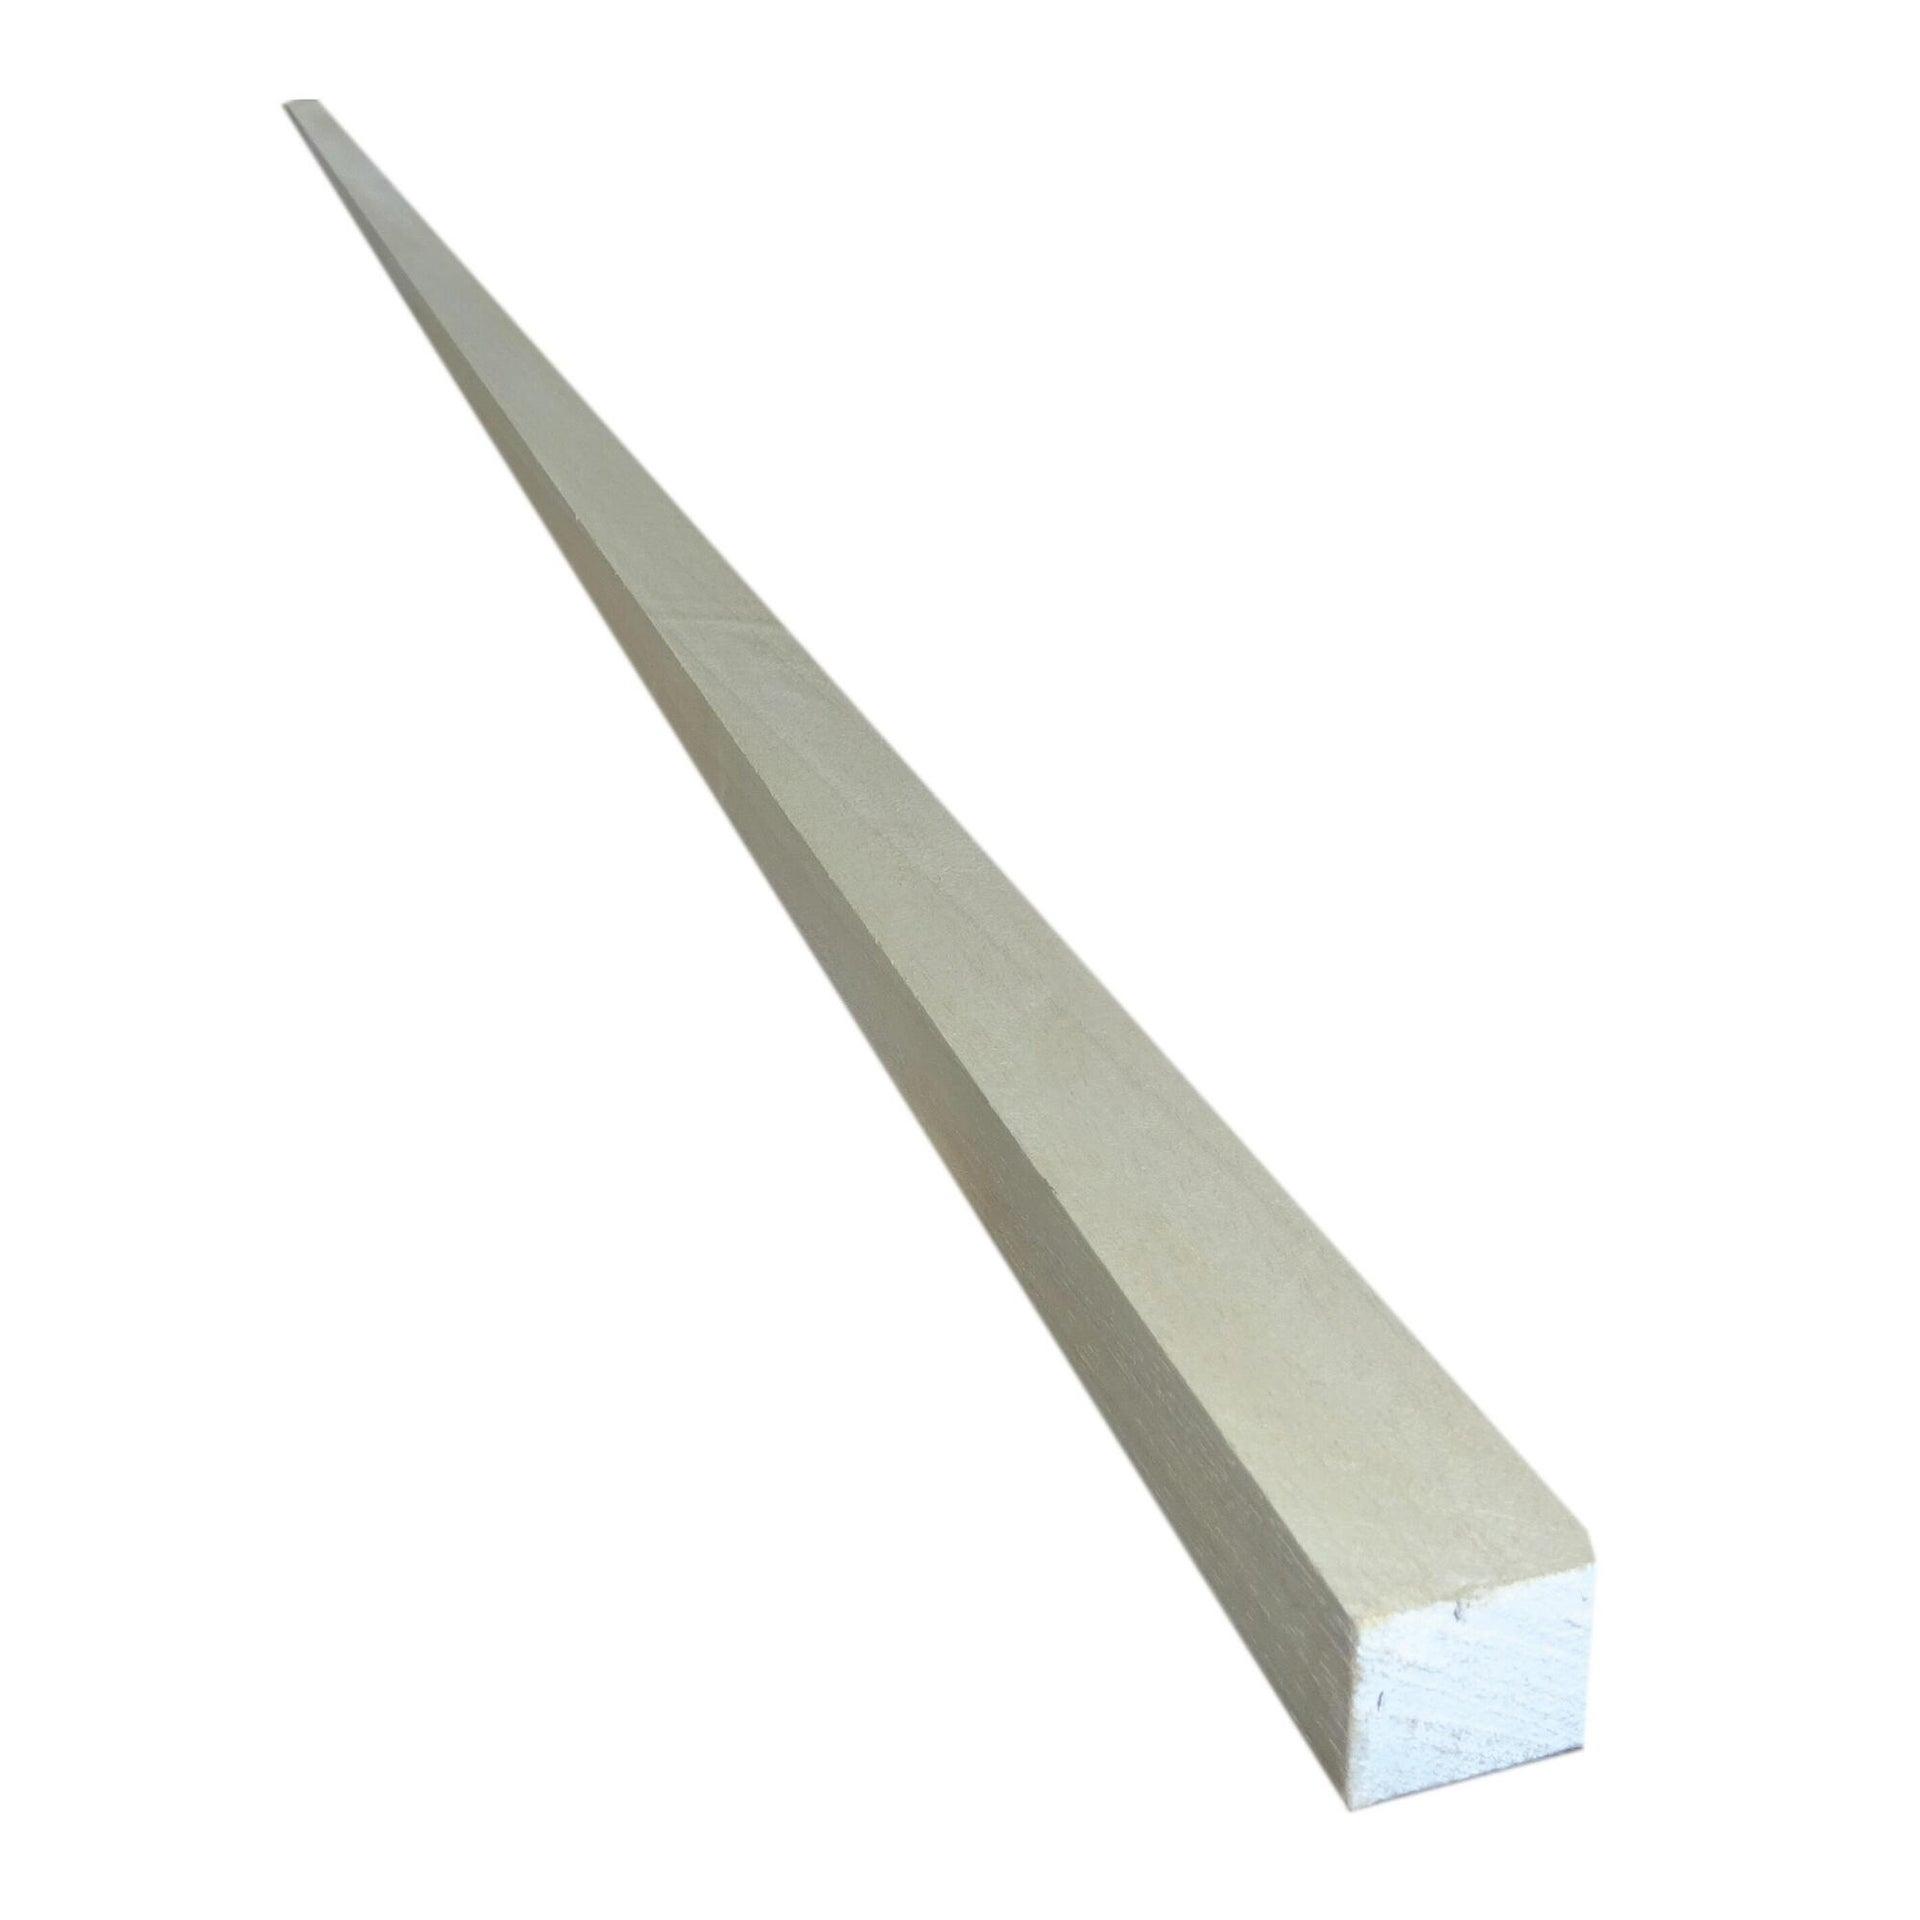 Listello piallato ayous 2.4 m x 30 mm, Sp 20 mm